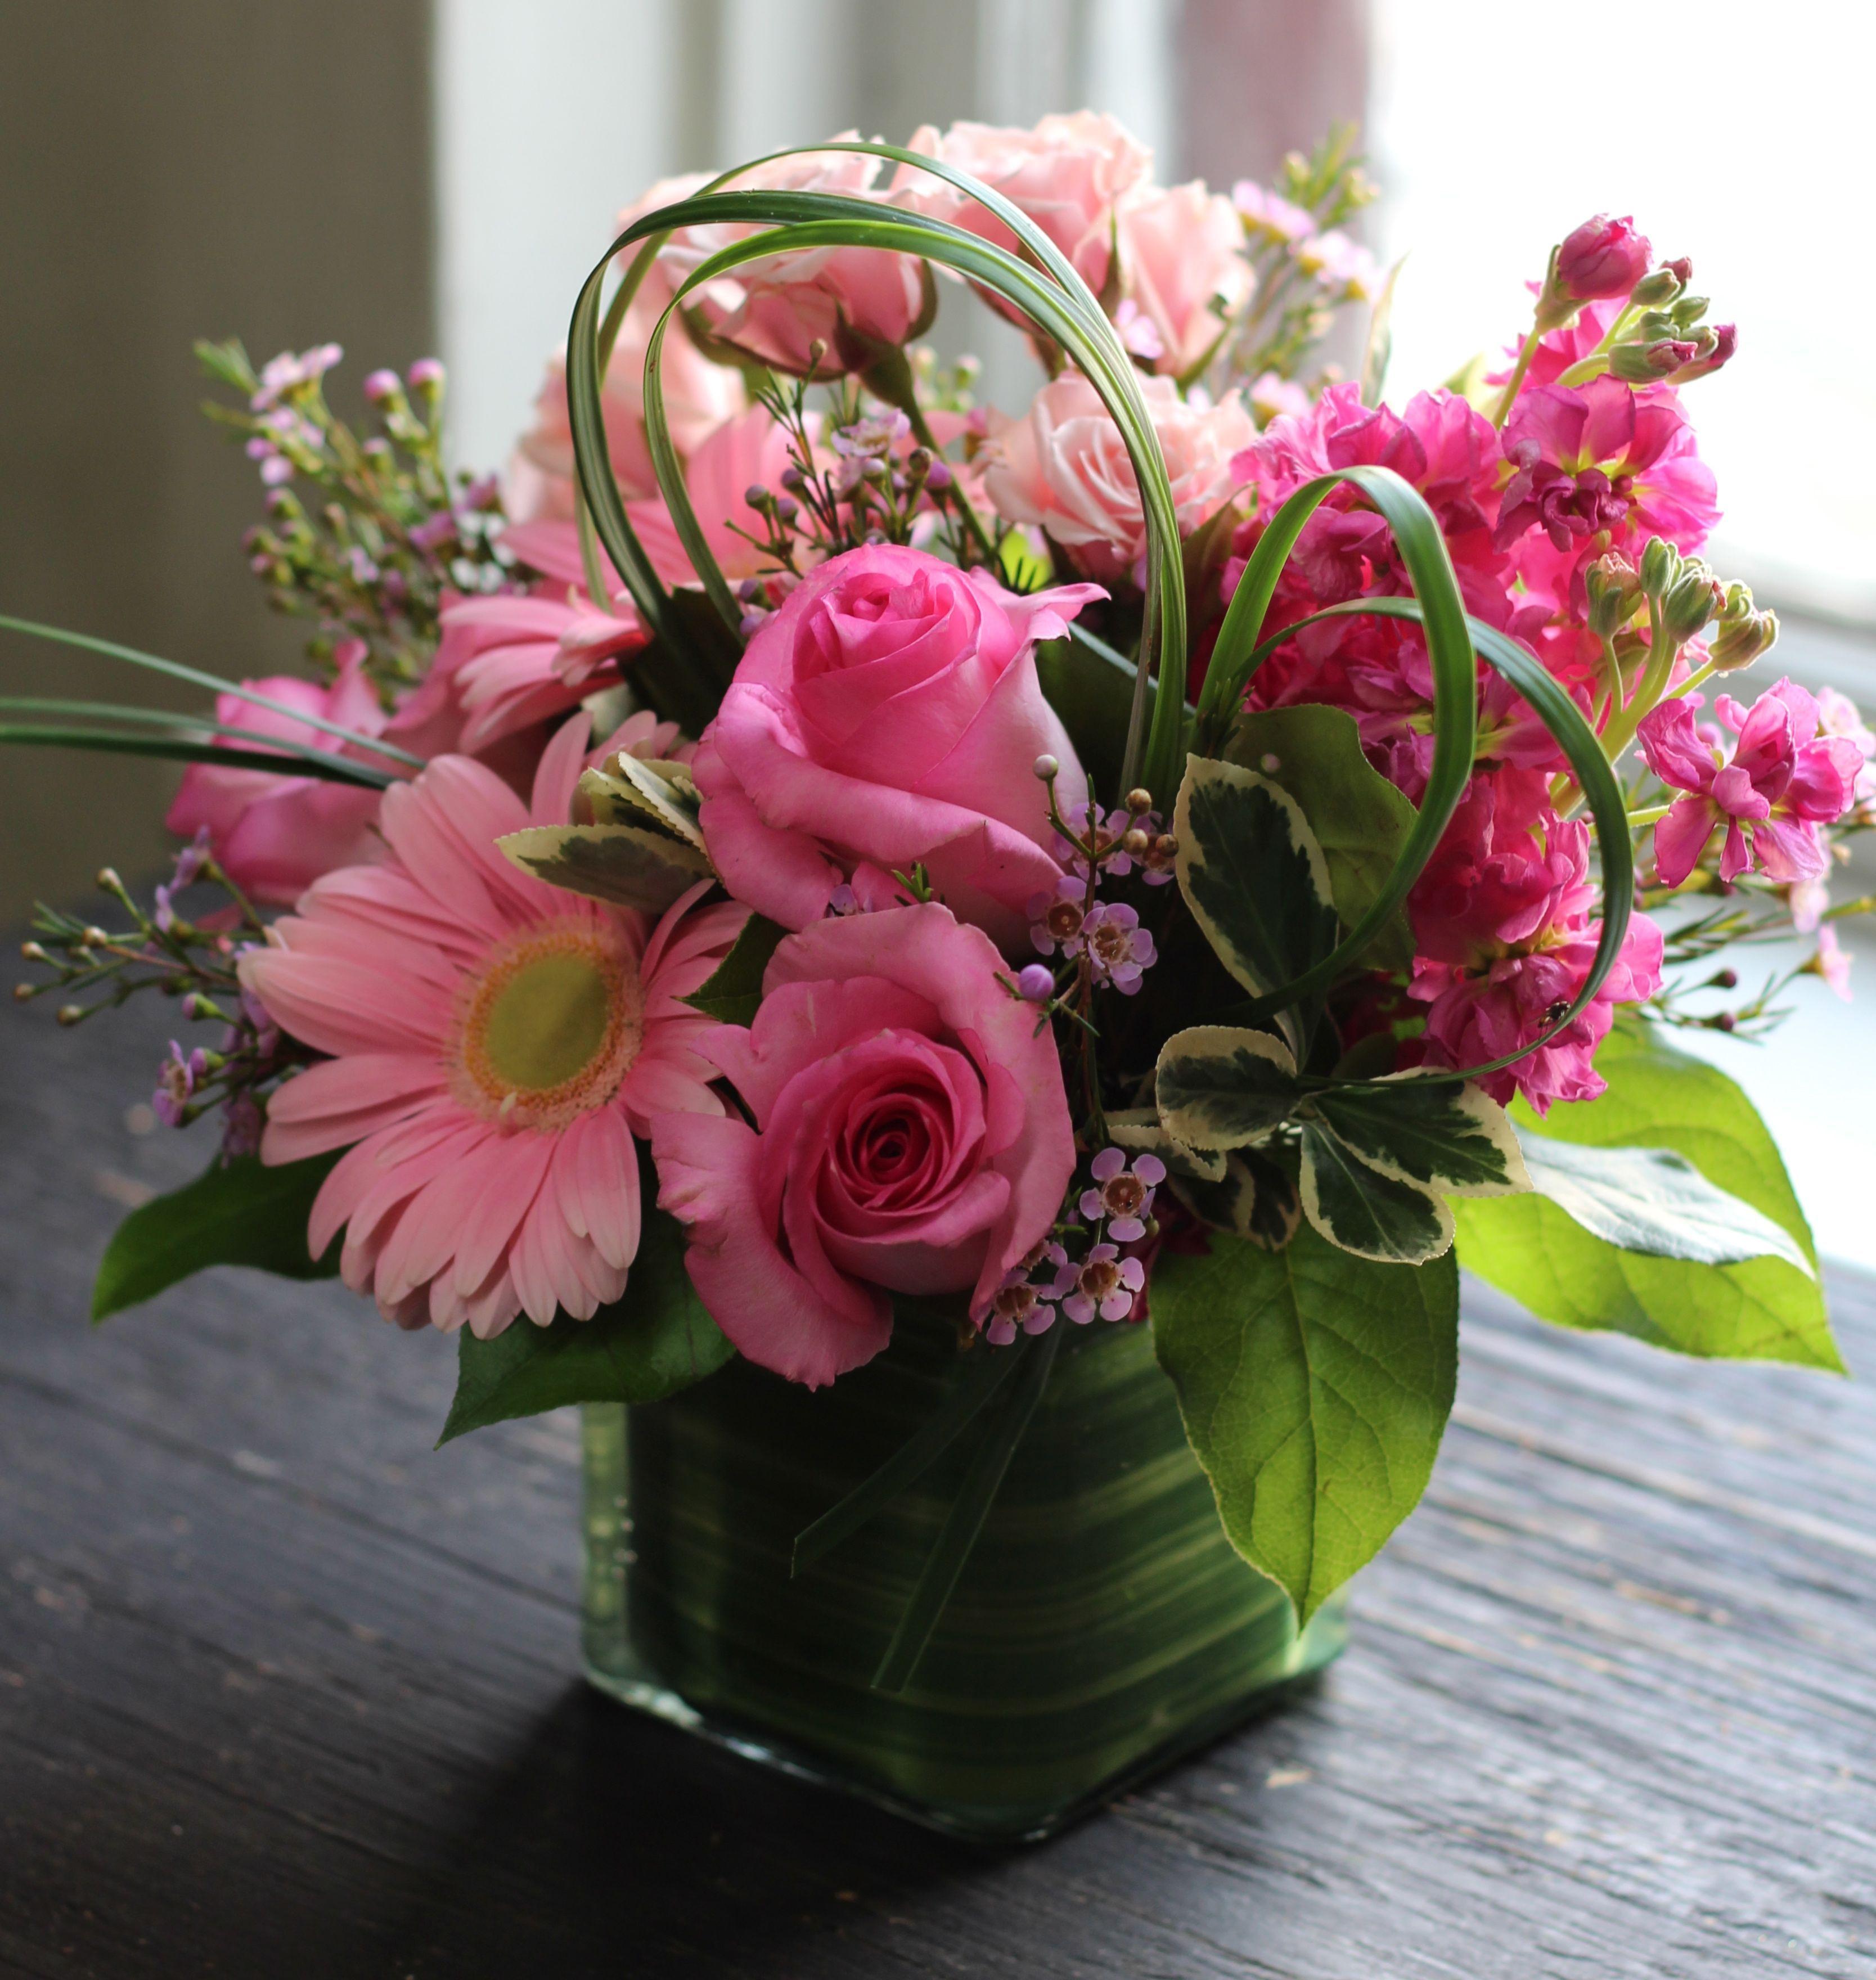 Pinkflowerarrangement floral pinterest beautiful flower pinkflowerarrangement beautiful flower arrangementsbeautiful izmirmasajfo